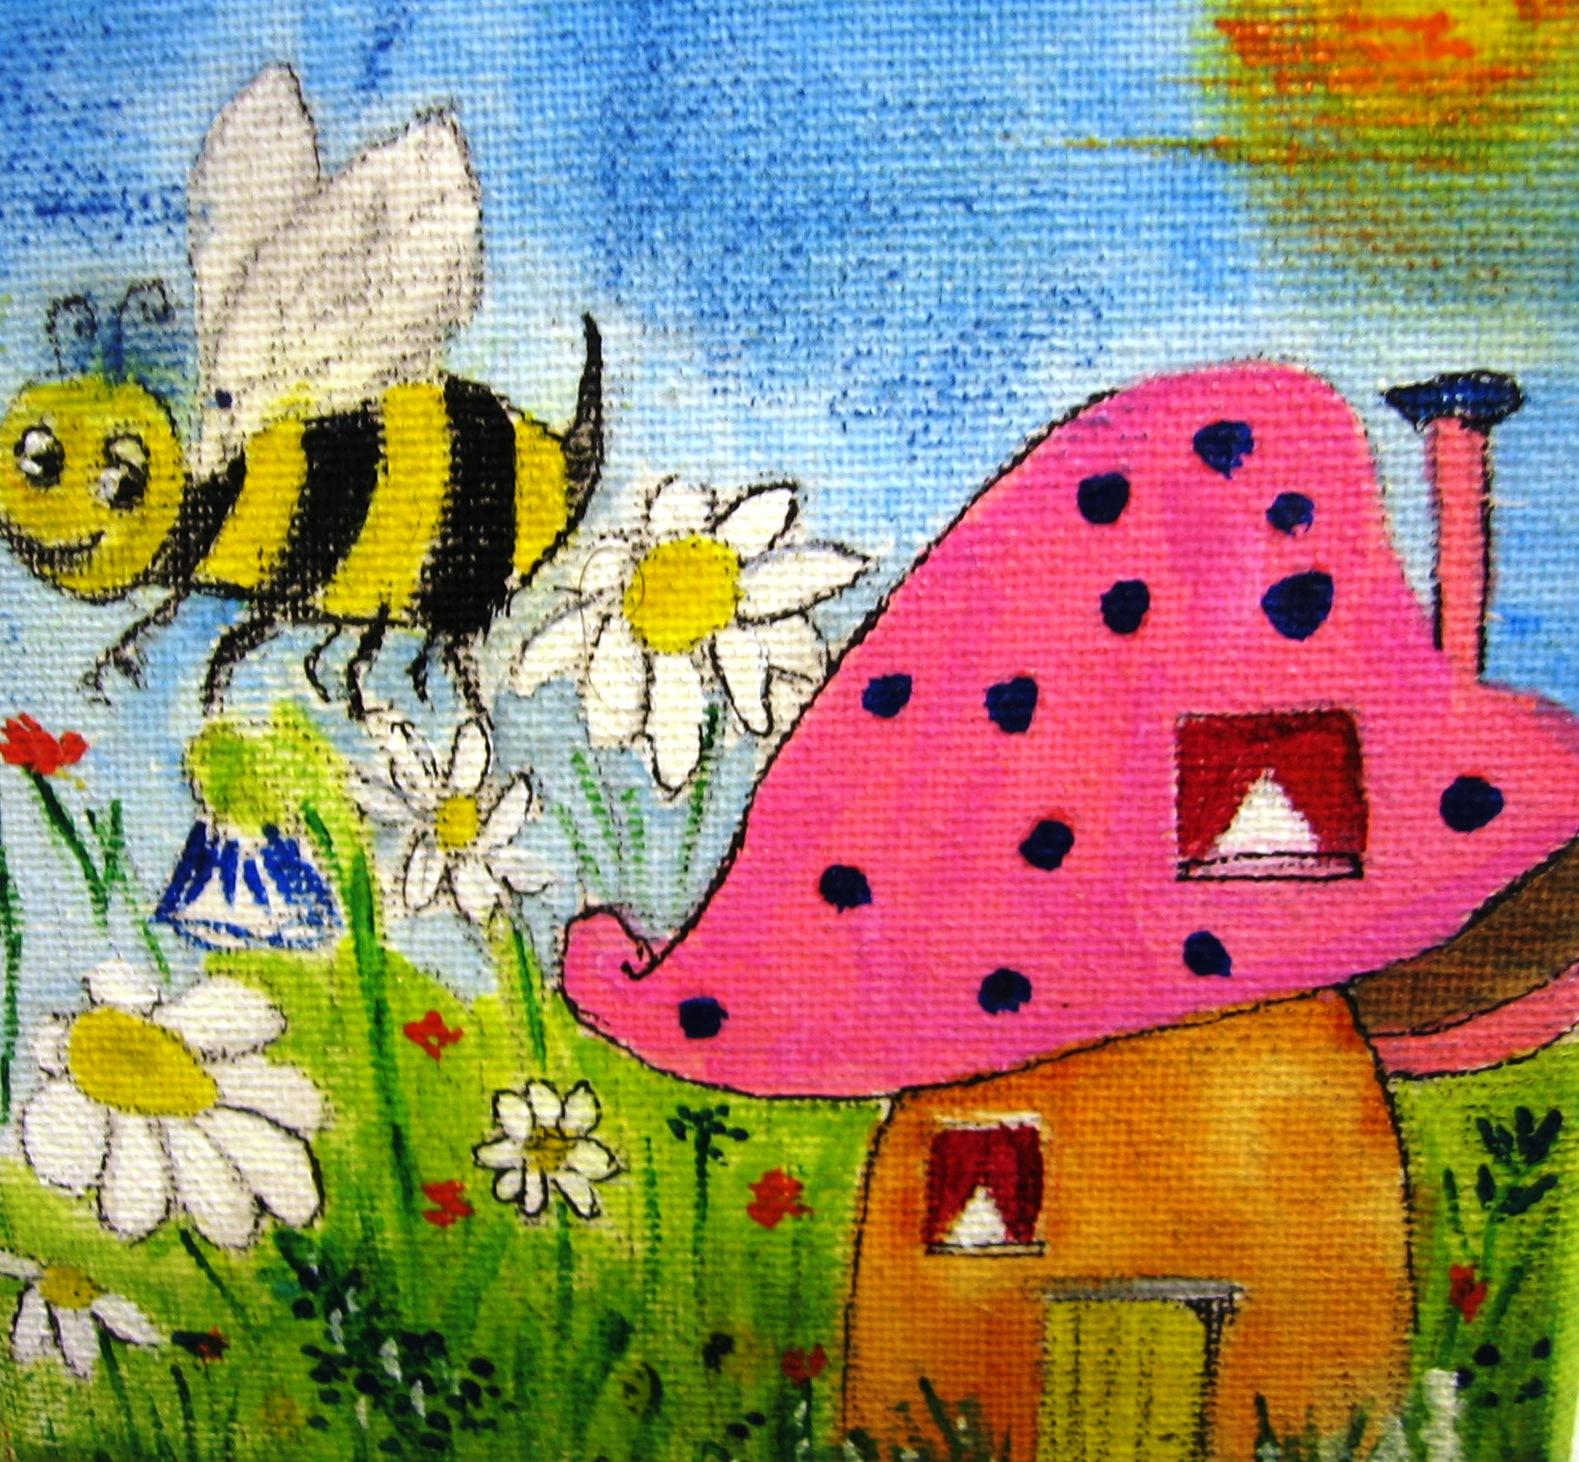 Childrens Wall Art: Childrens Wall Art: Themed Canvas ...